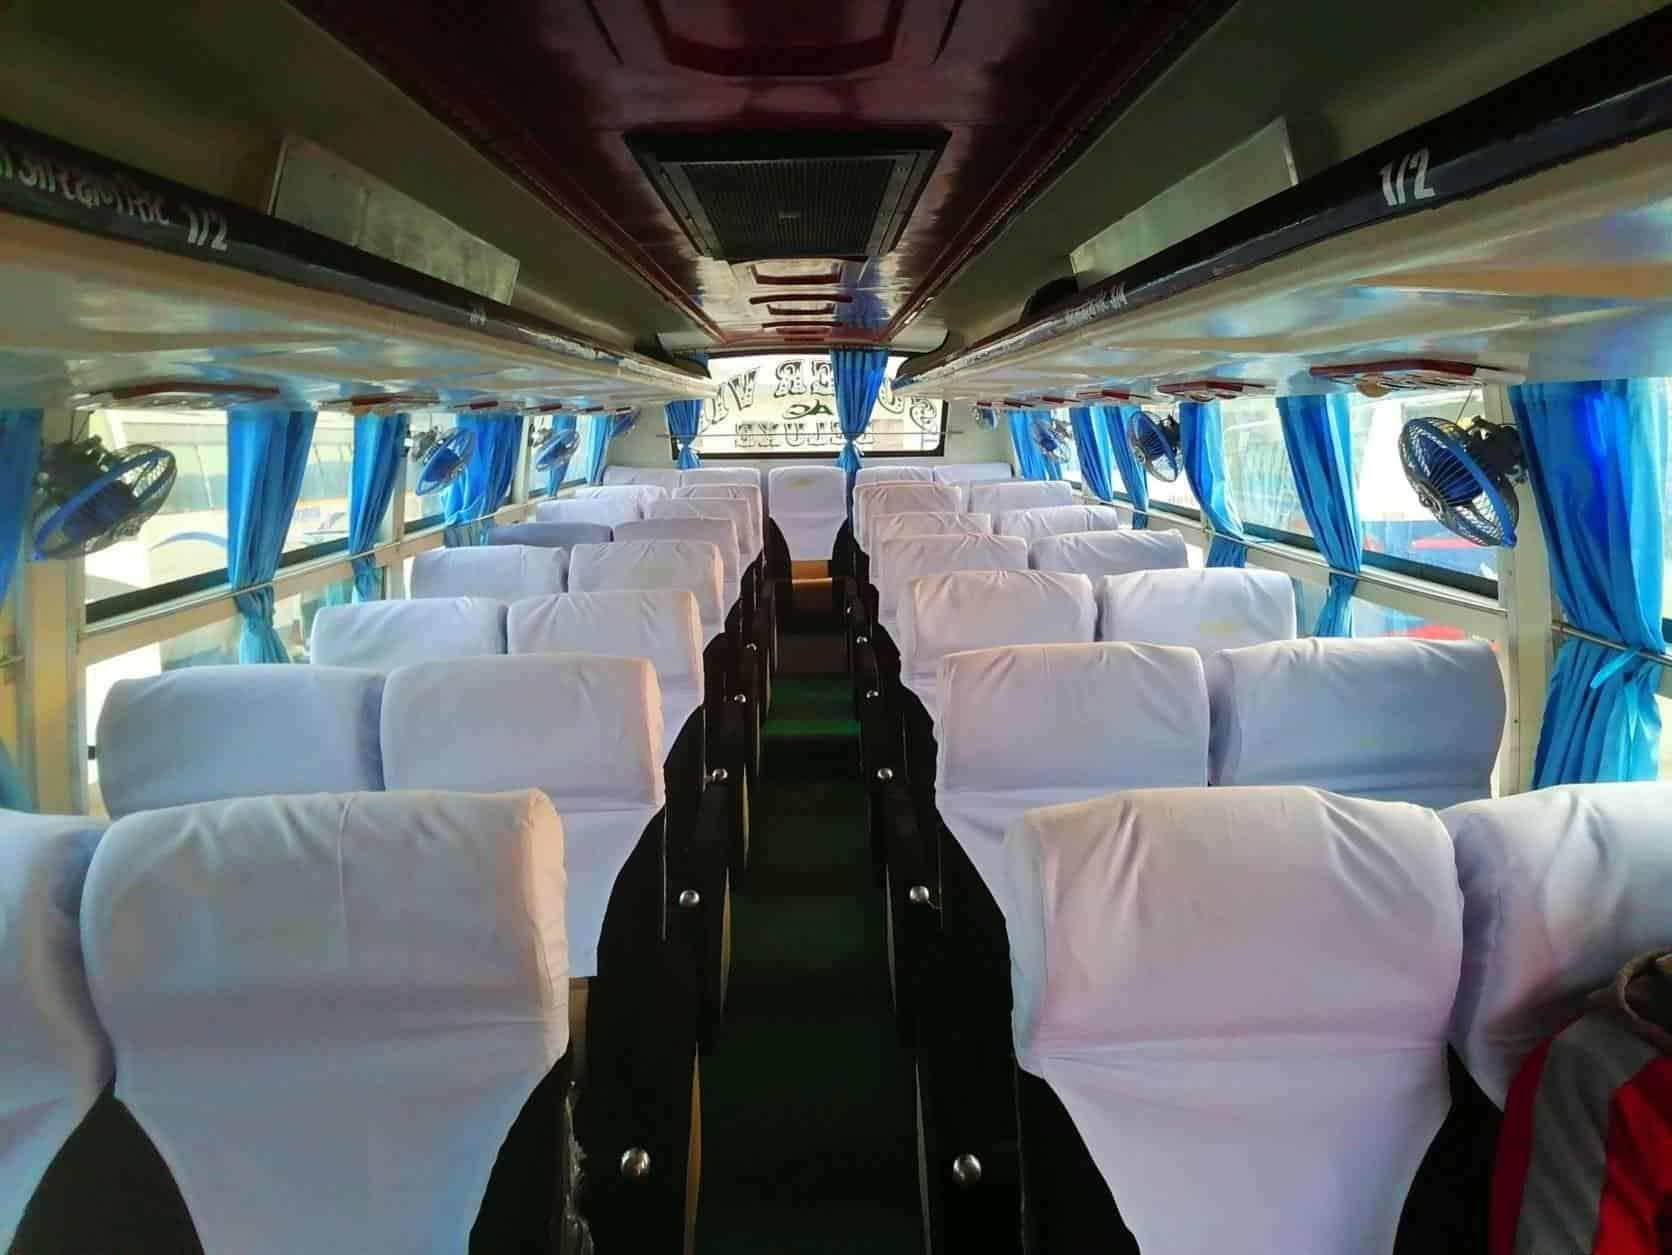 Kathmandu Pokhara Super Deluxe Bus with Toilet Night Bus